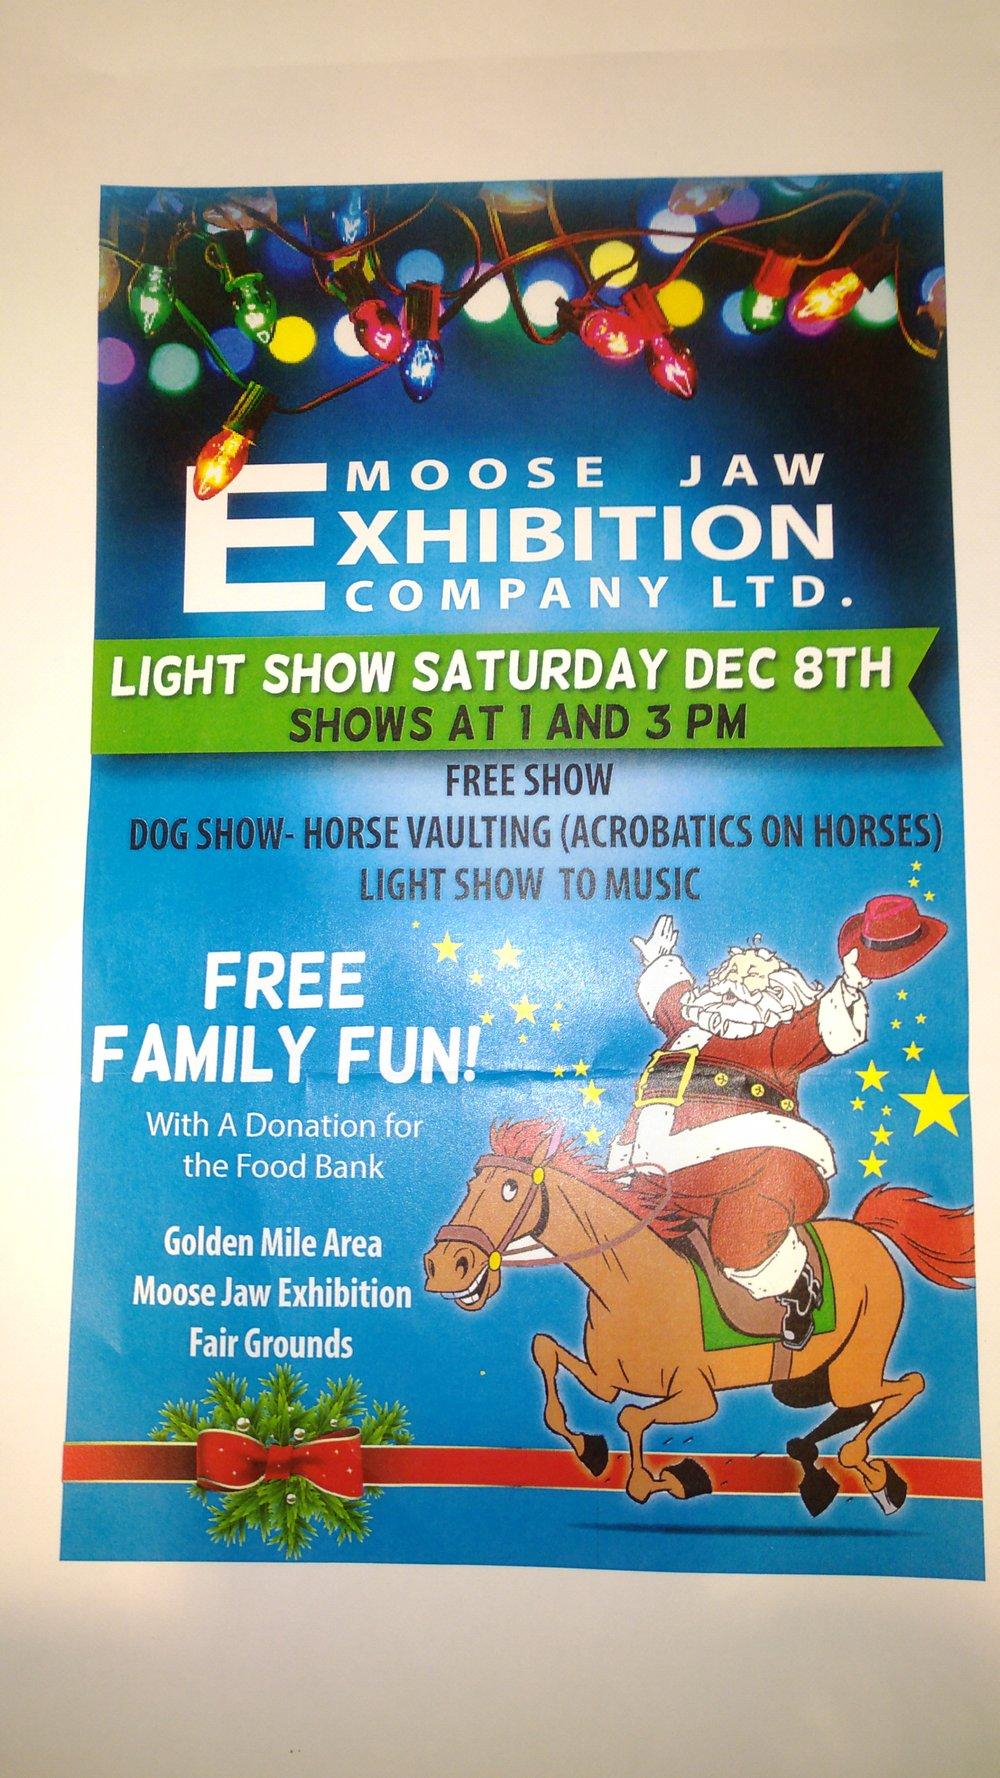 Courtesy Moose Jaw Exhibition Company